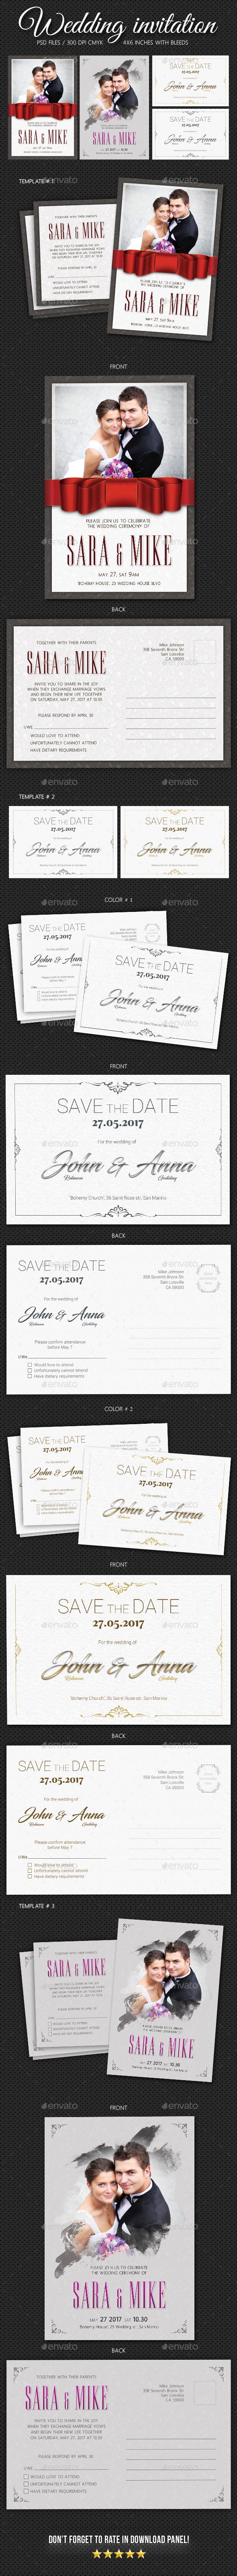 Wedding Invitation Bundle 3 - Cards & Invites Print Templates